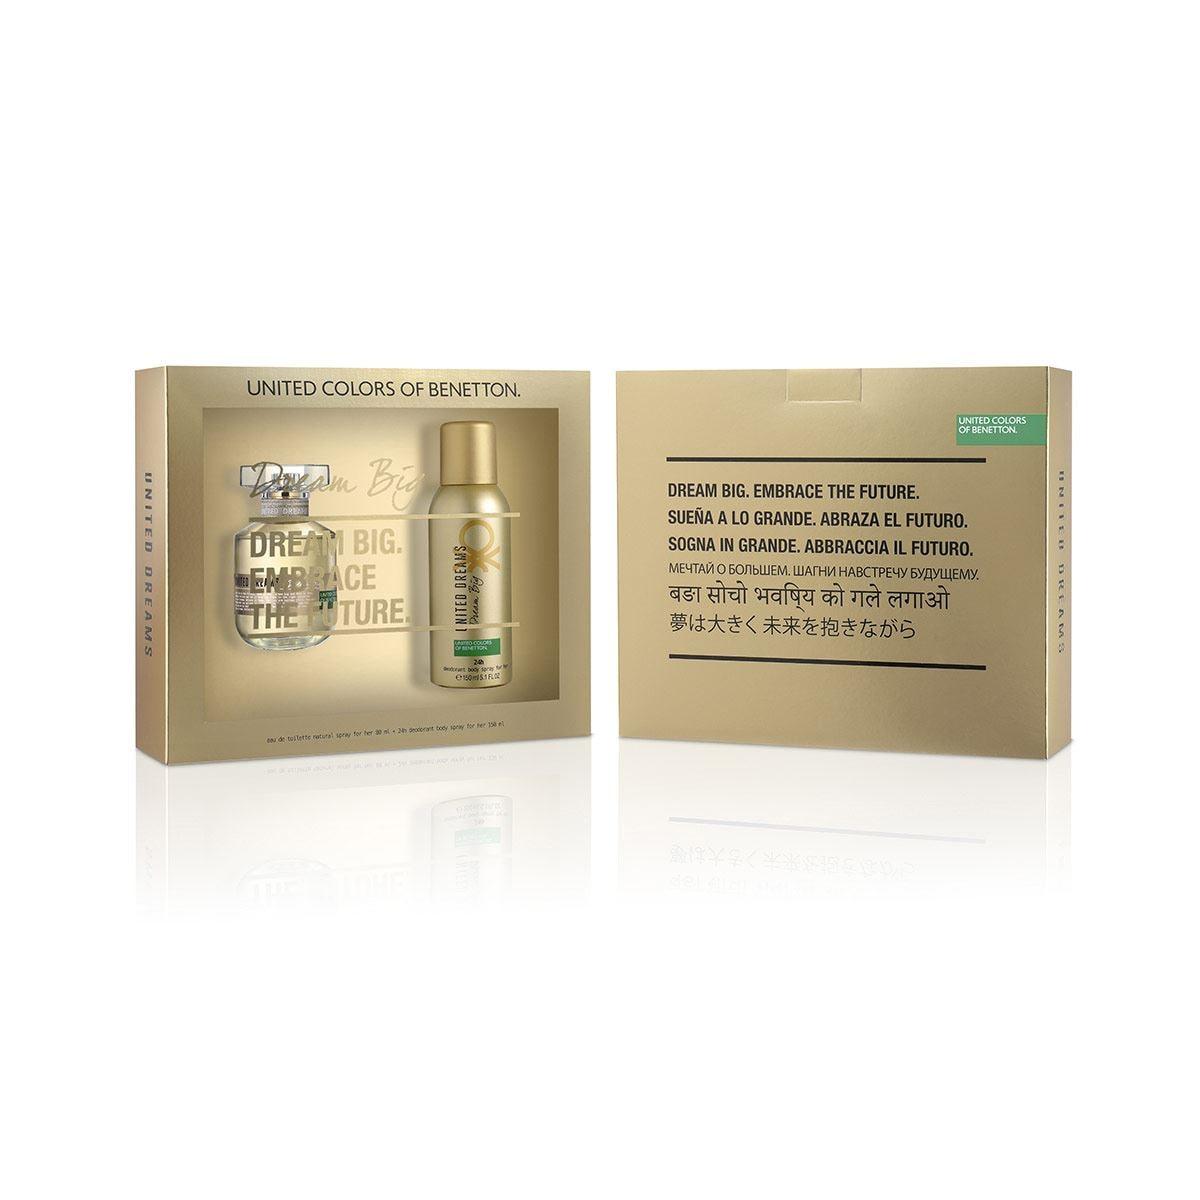 Set para Dama, Benetton United Dreams Dream Big EDT 80ML + Desodorante 150ML